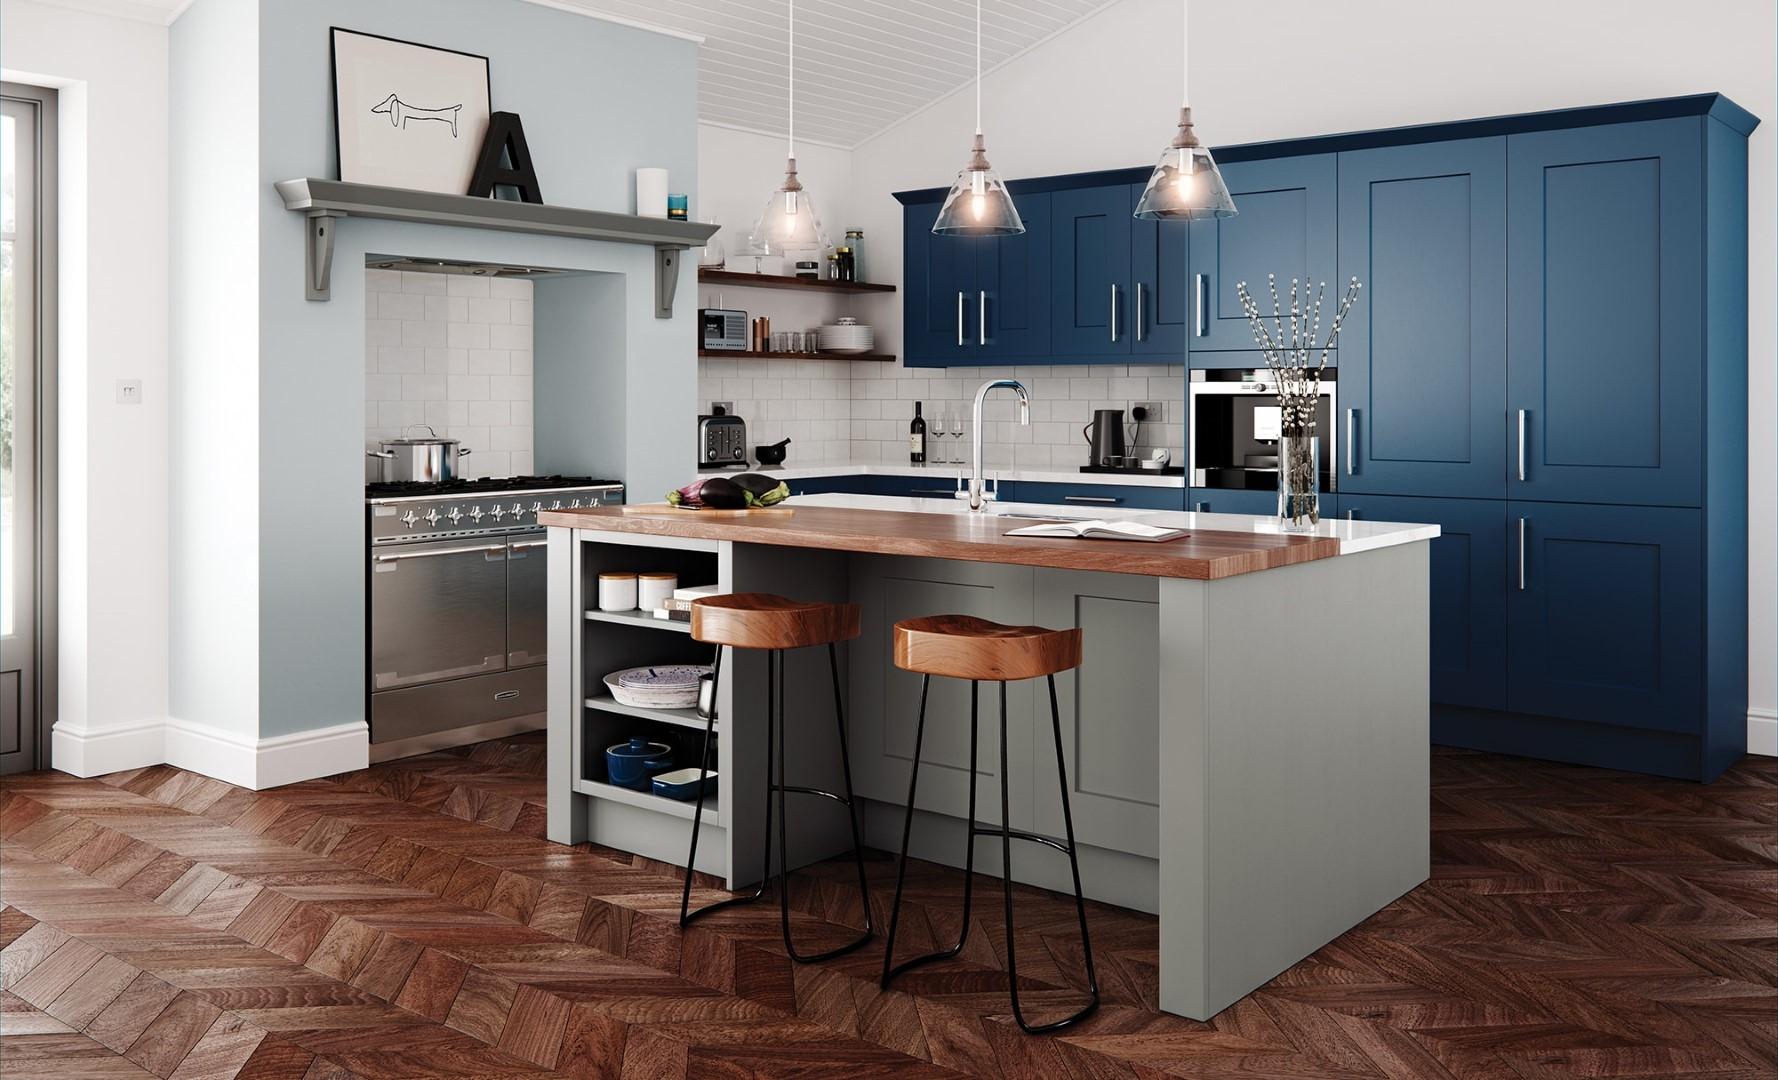 Classic Traditional Kitchen - Clonmel Shaker Kitchen - Stone, Parisian Blue Kitchen - Kitchen Design - Alan Kelly Kitchens - Waterford